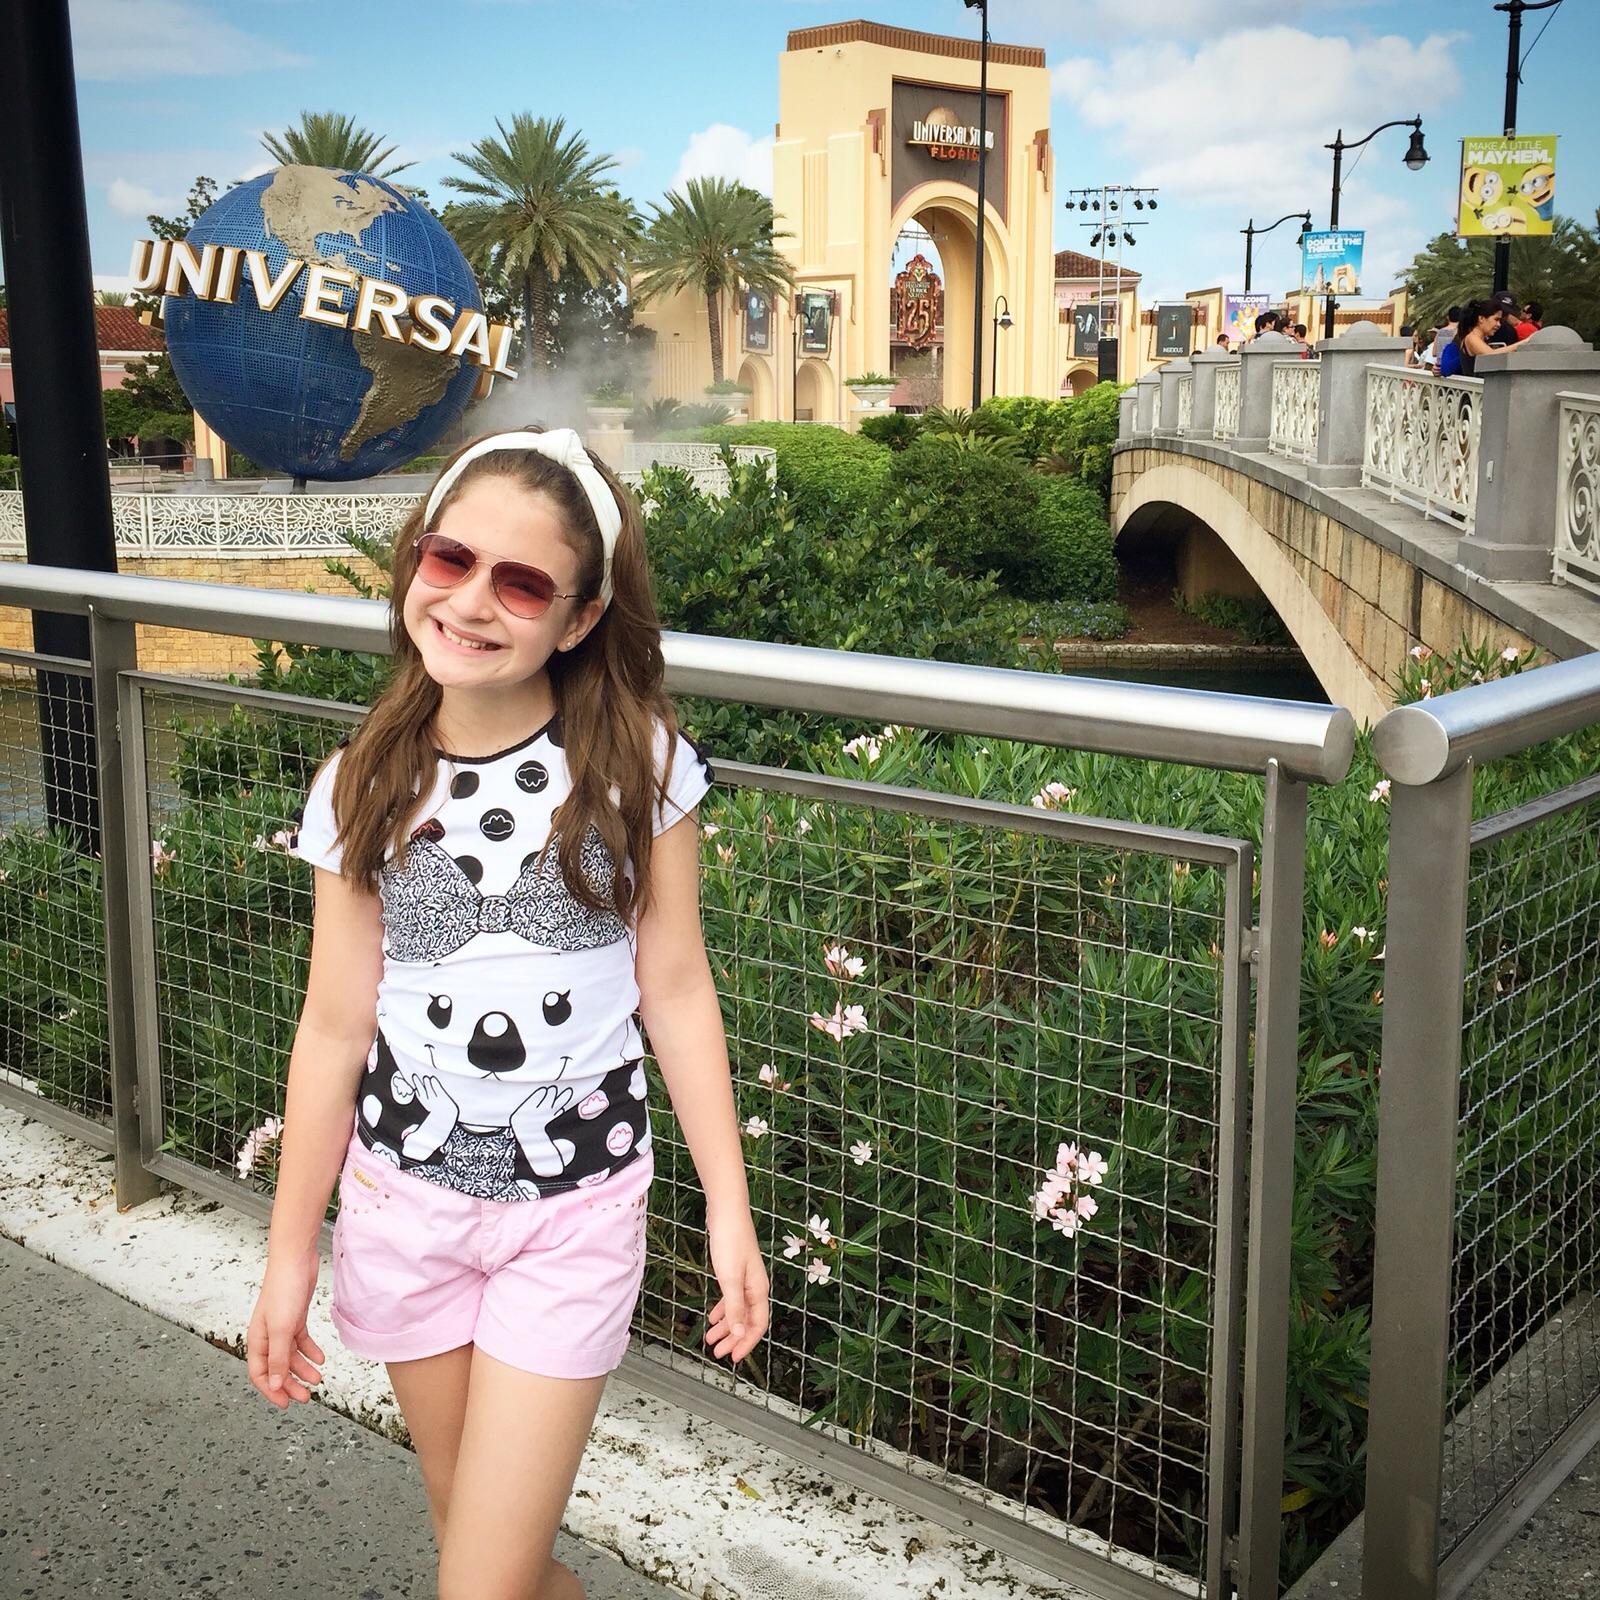 Arrasando na Universal Studios.